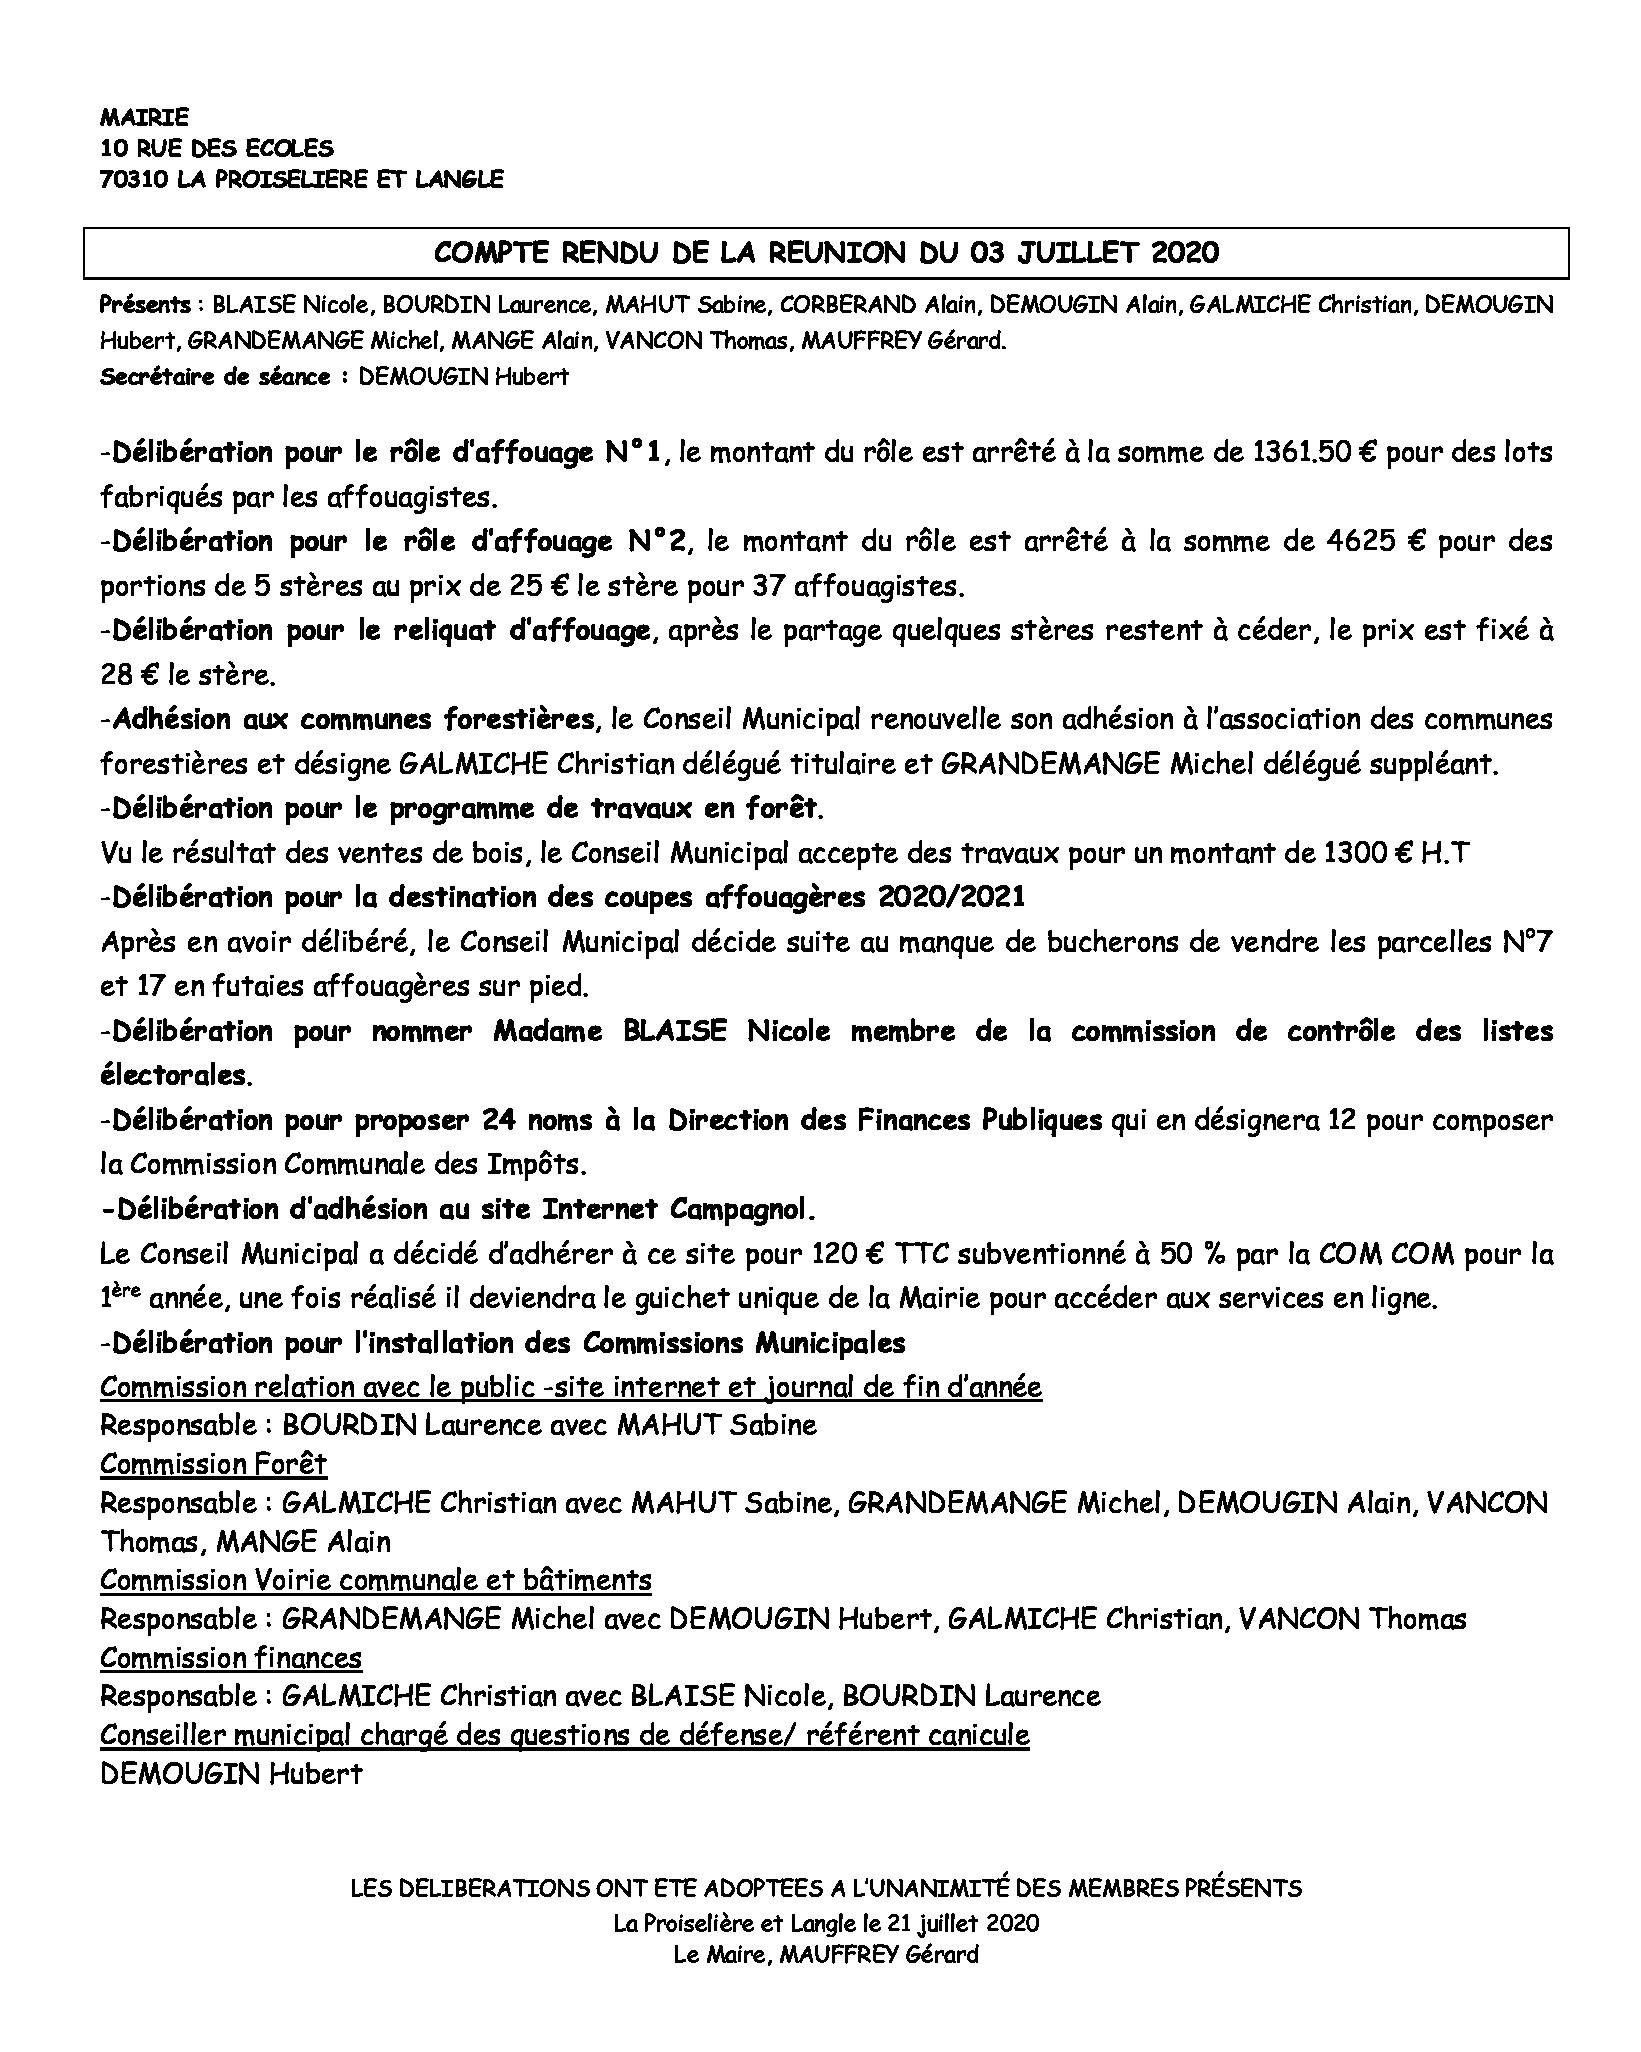 COMPTE RENDU du 03 Juillet 2020